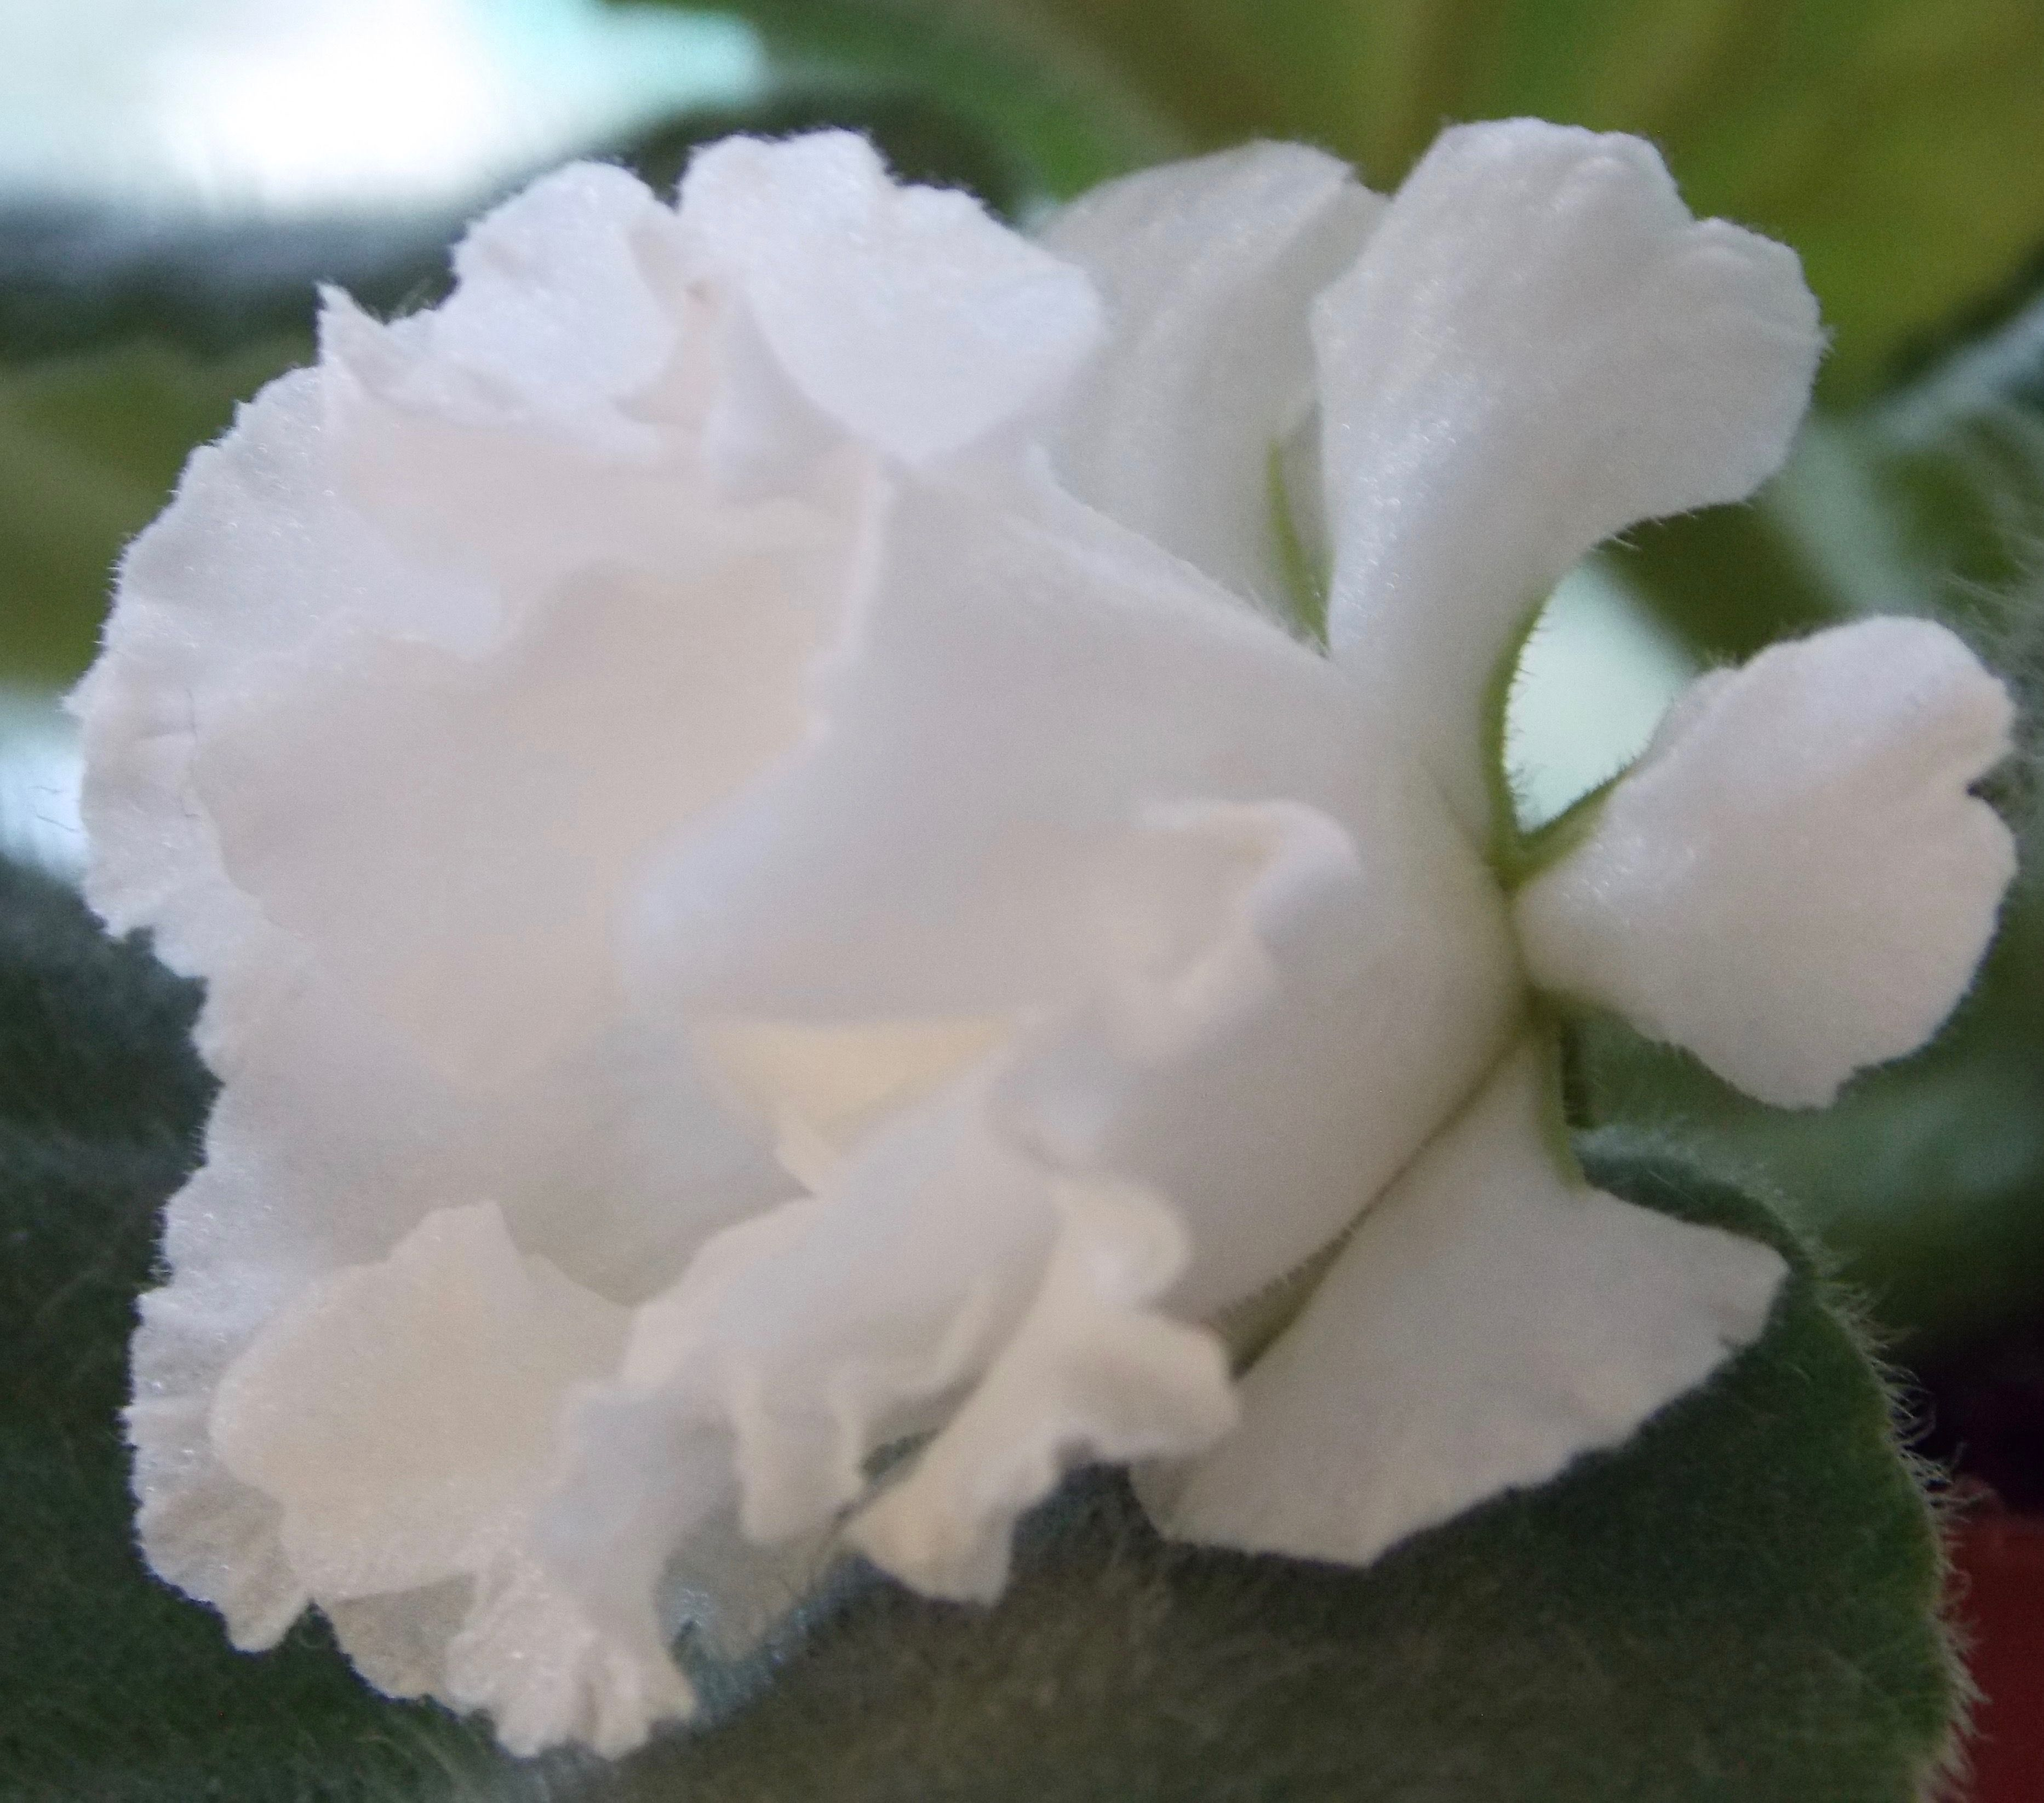 Pin By Martha Lewis On White Flowers Garden Pinterest